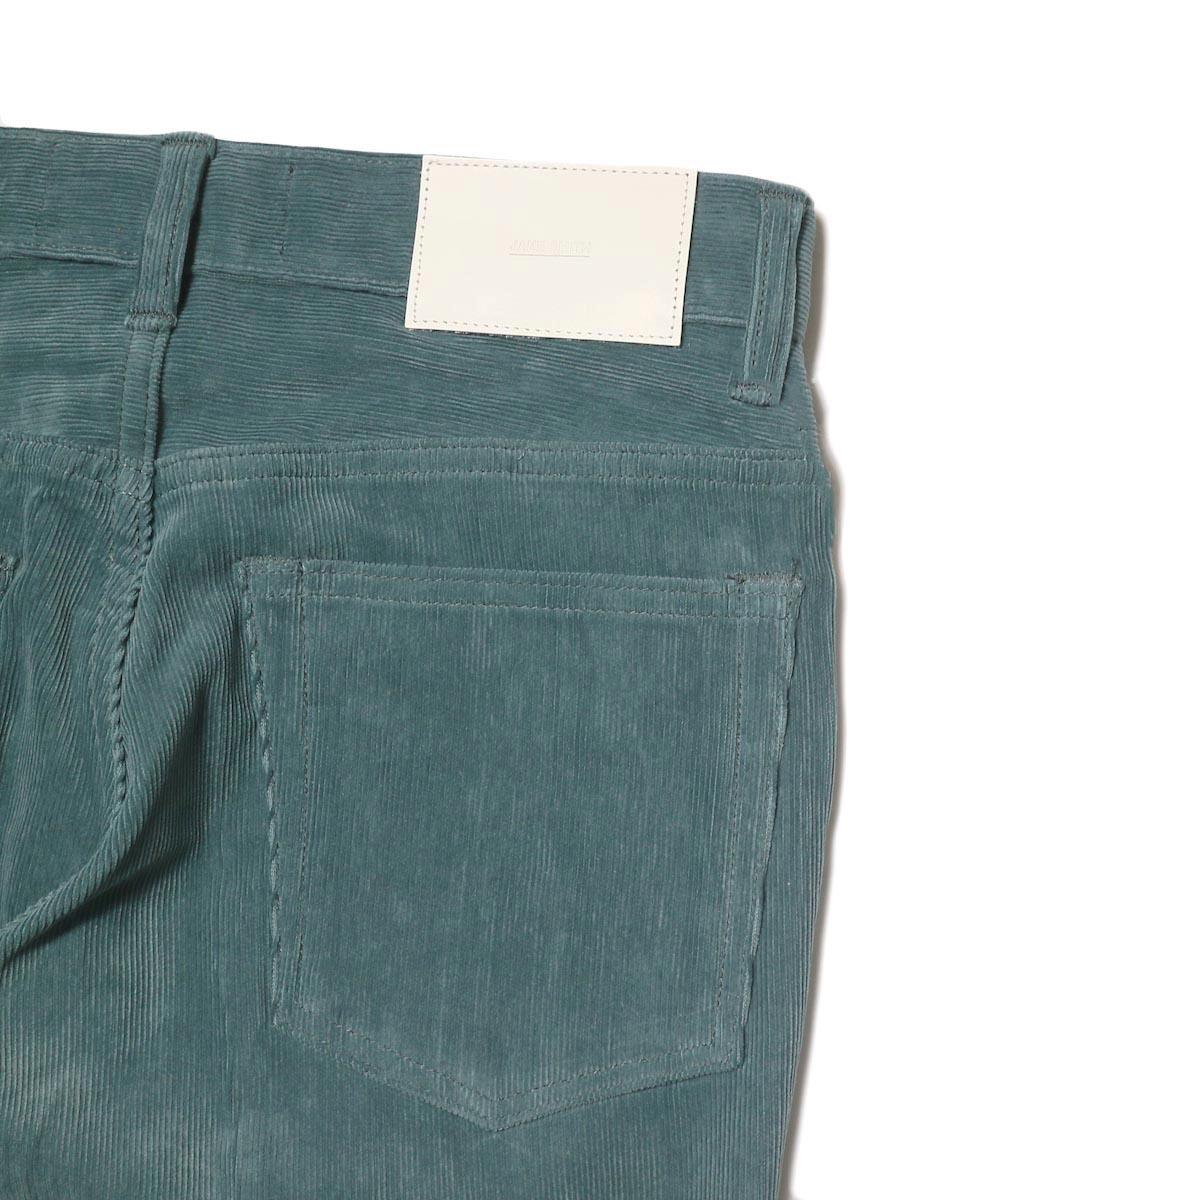 JANE SMITH / 5POCKET BOOTSCUT (jade green) 背面ポケット